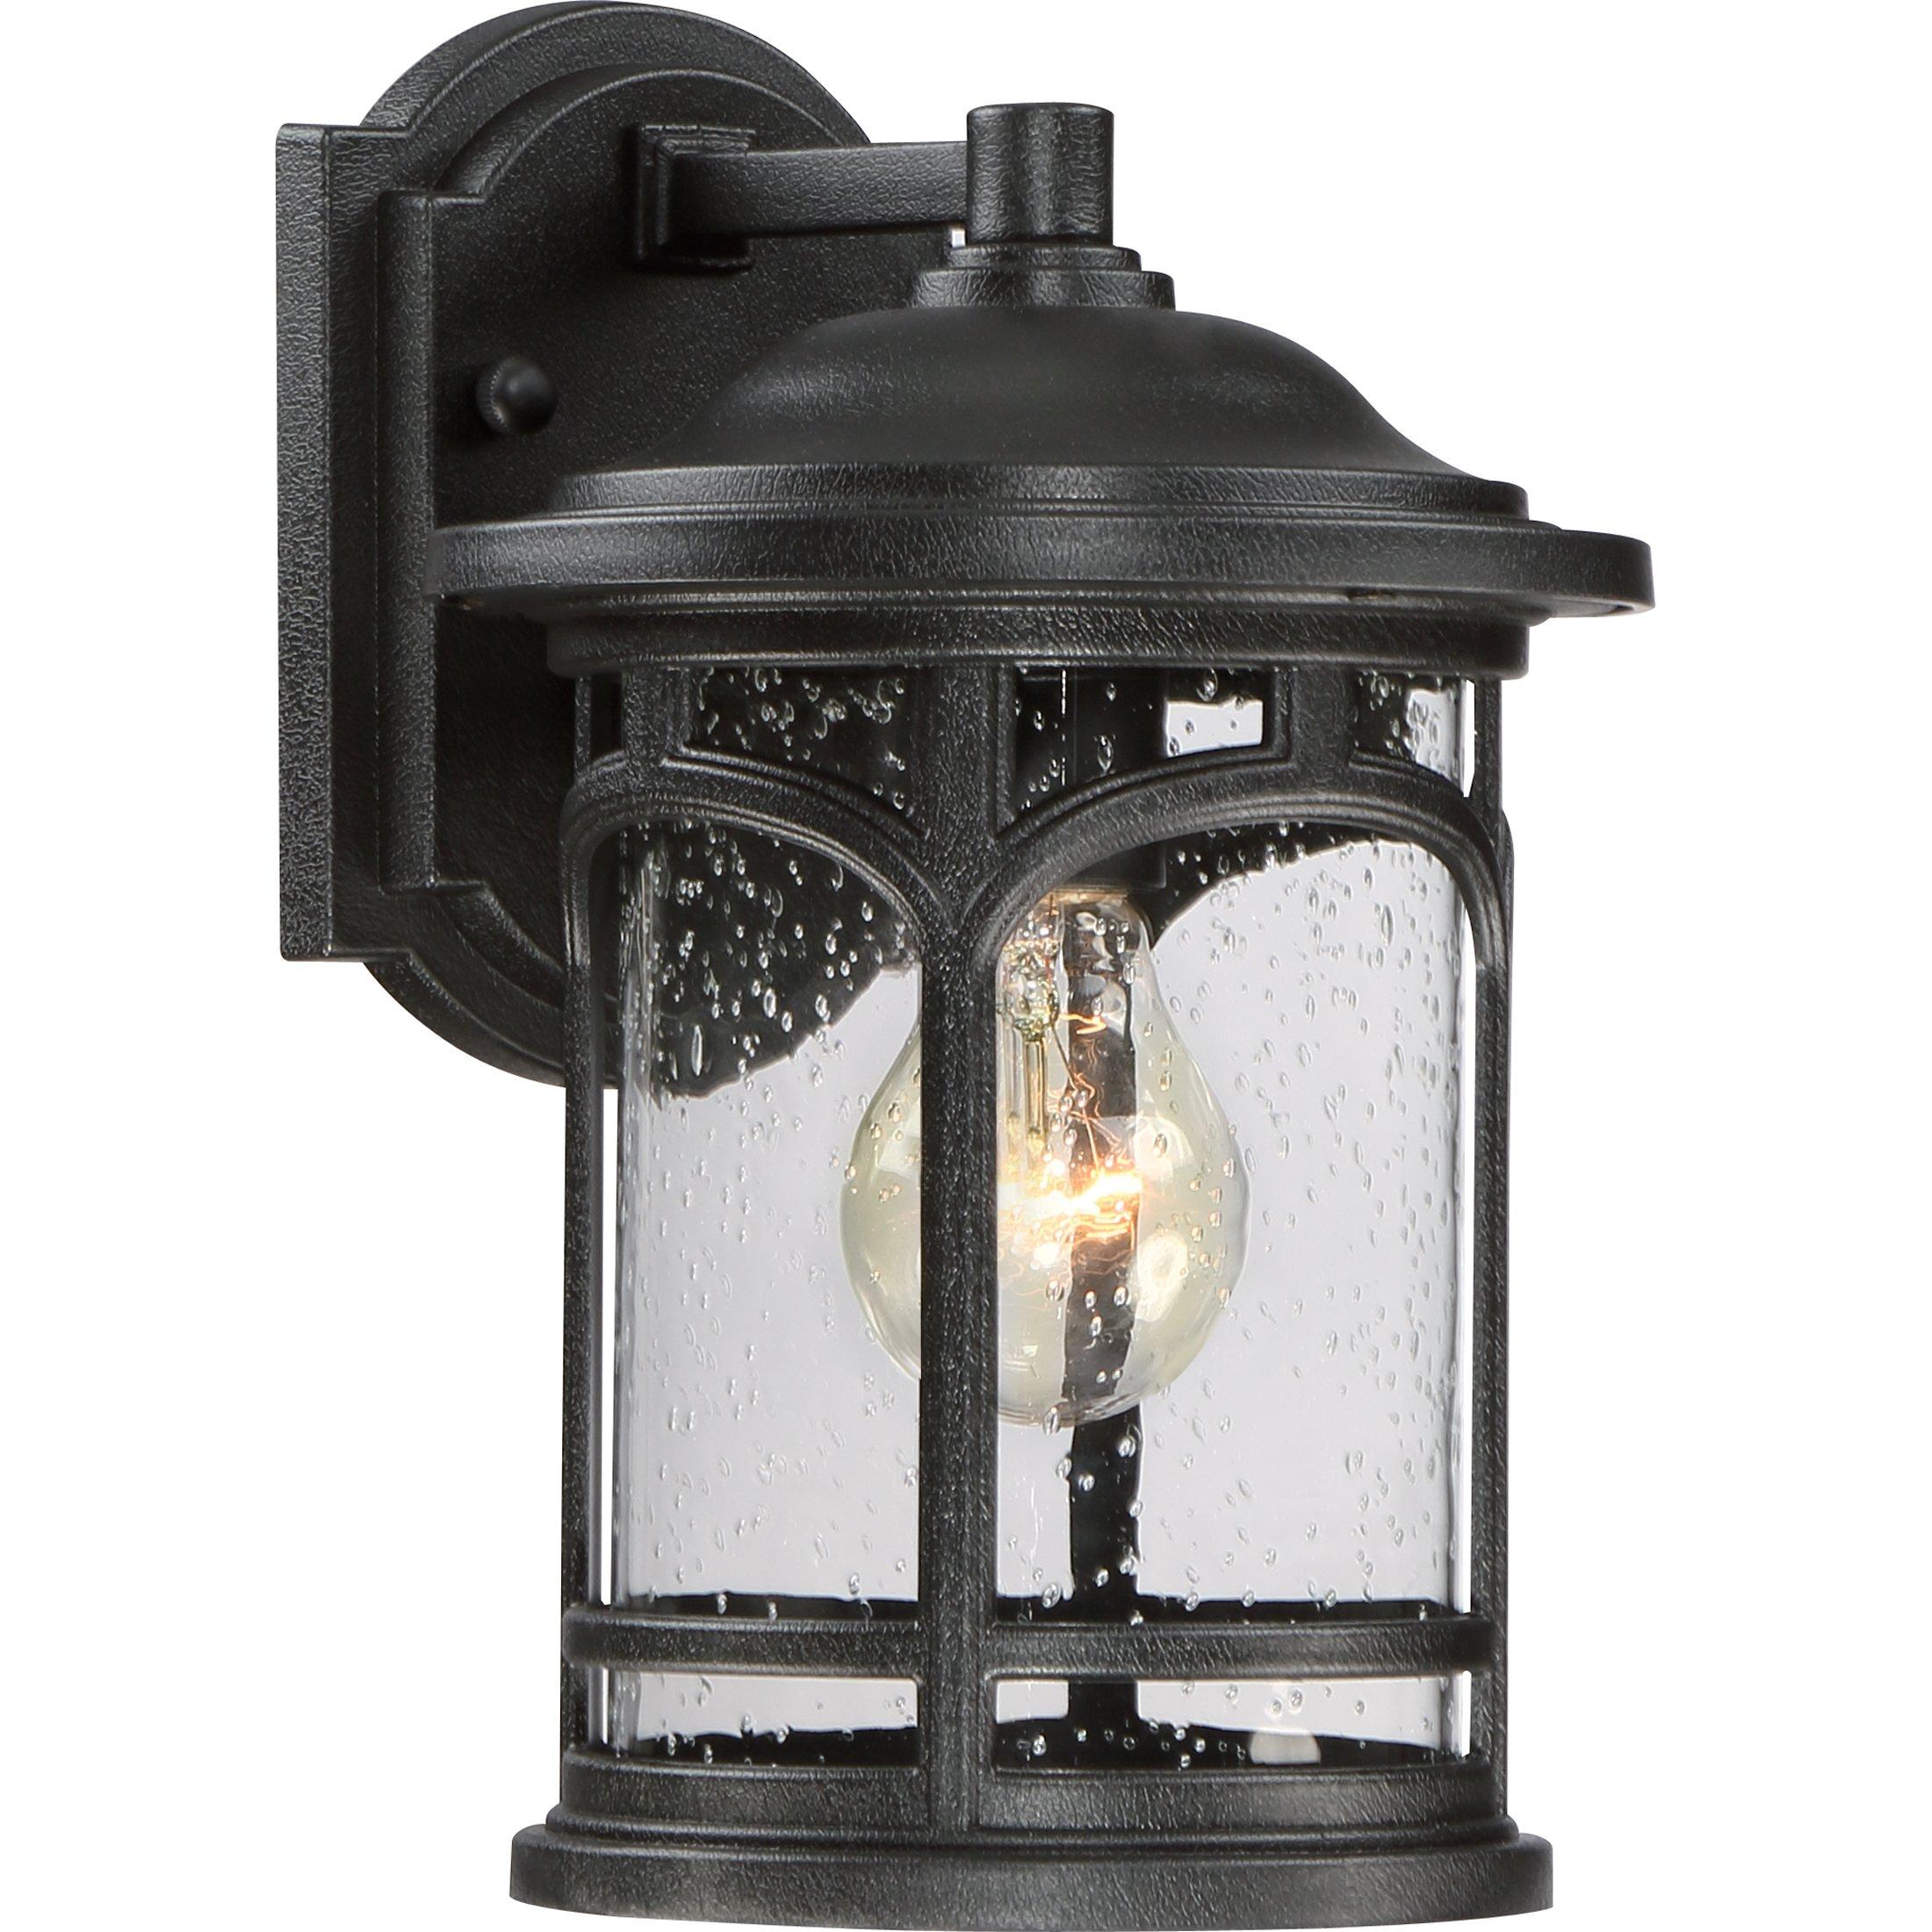 MBH8407KFL One Light Wall Marblehead Outdoor Lantern in Mystic Black